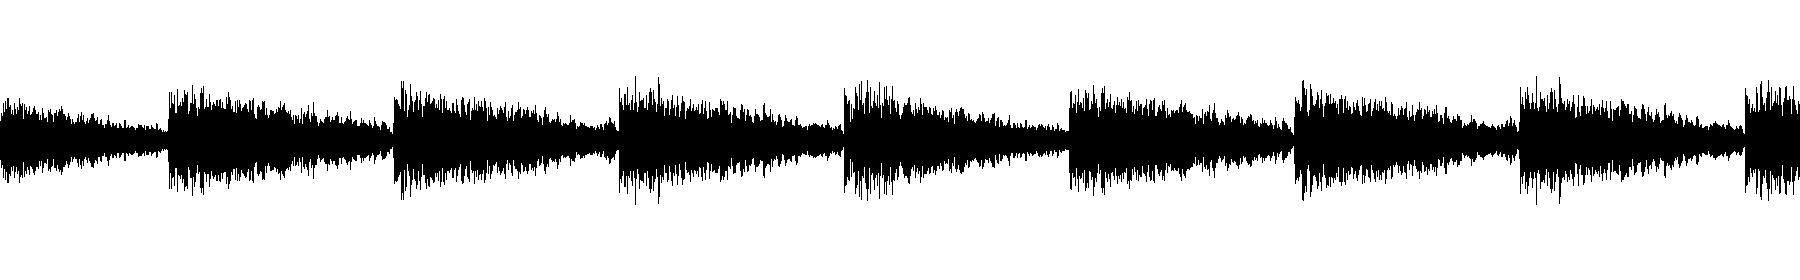 mf rdtf 018 percussion loops 125bpm